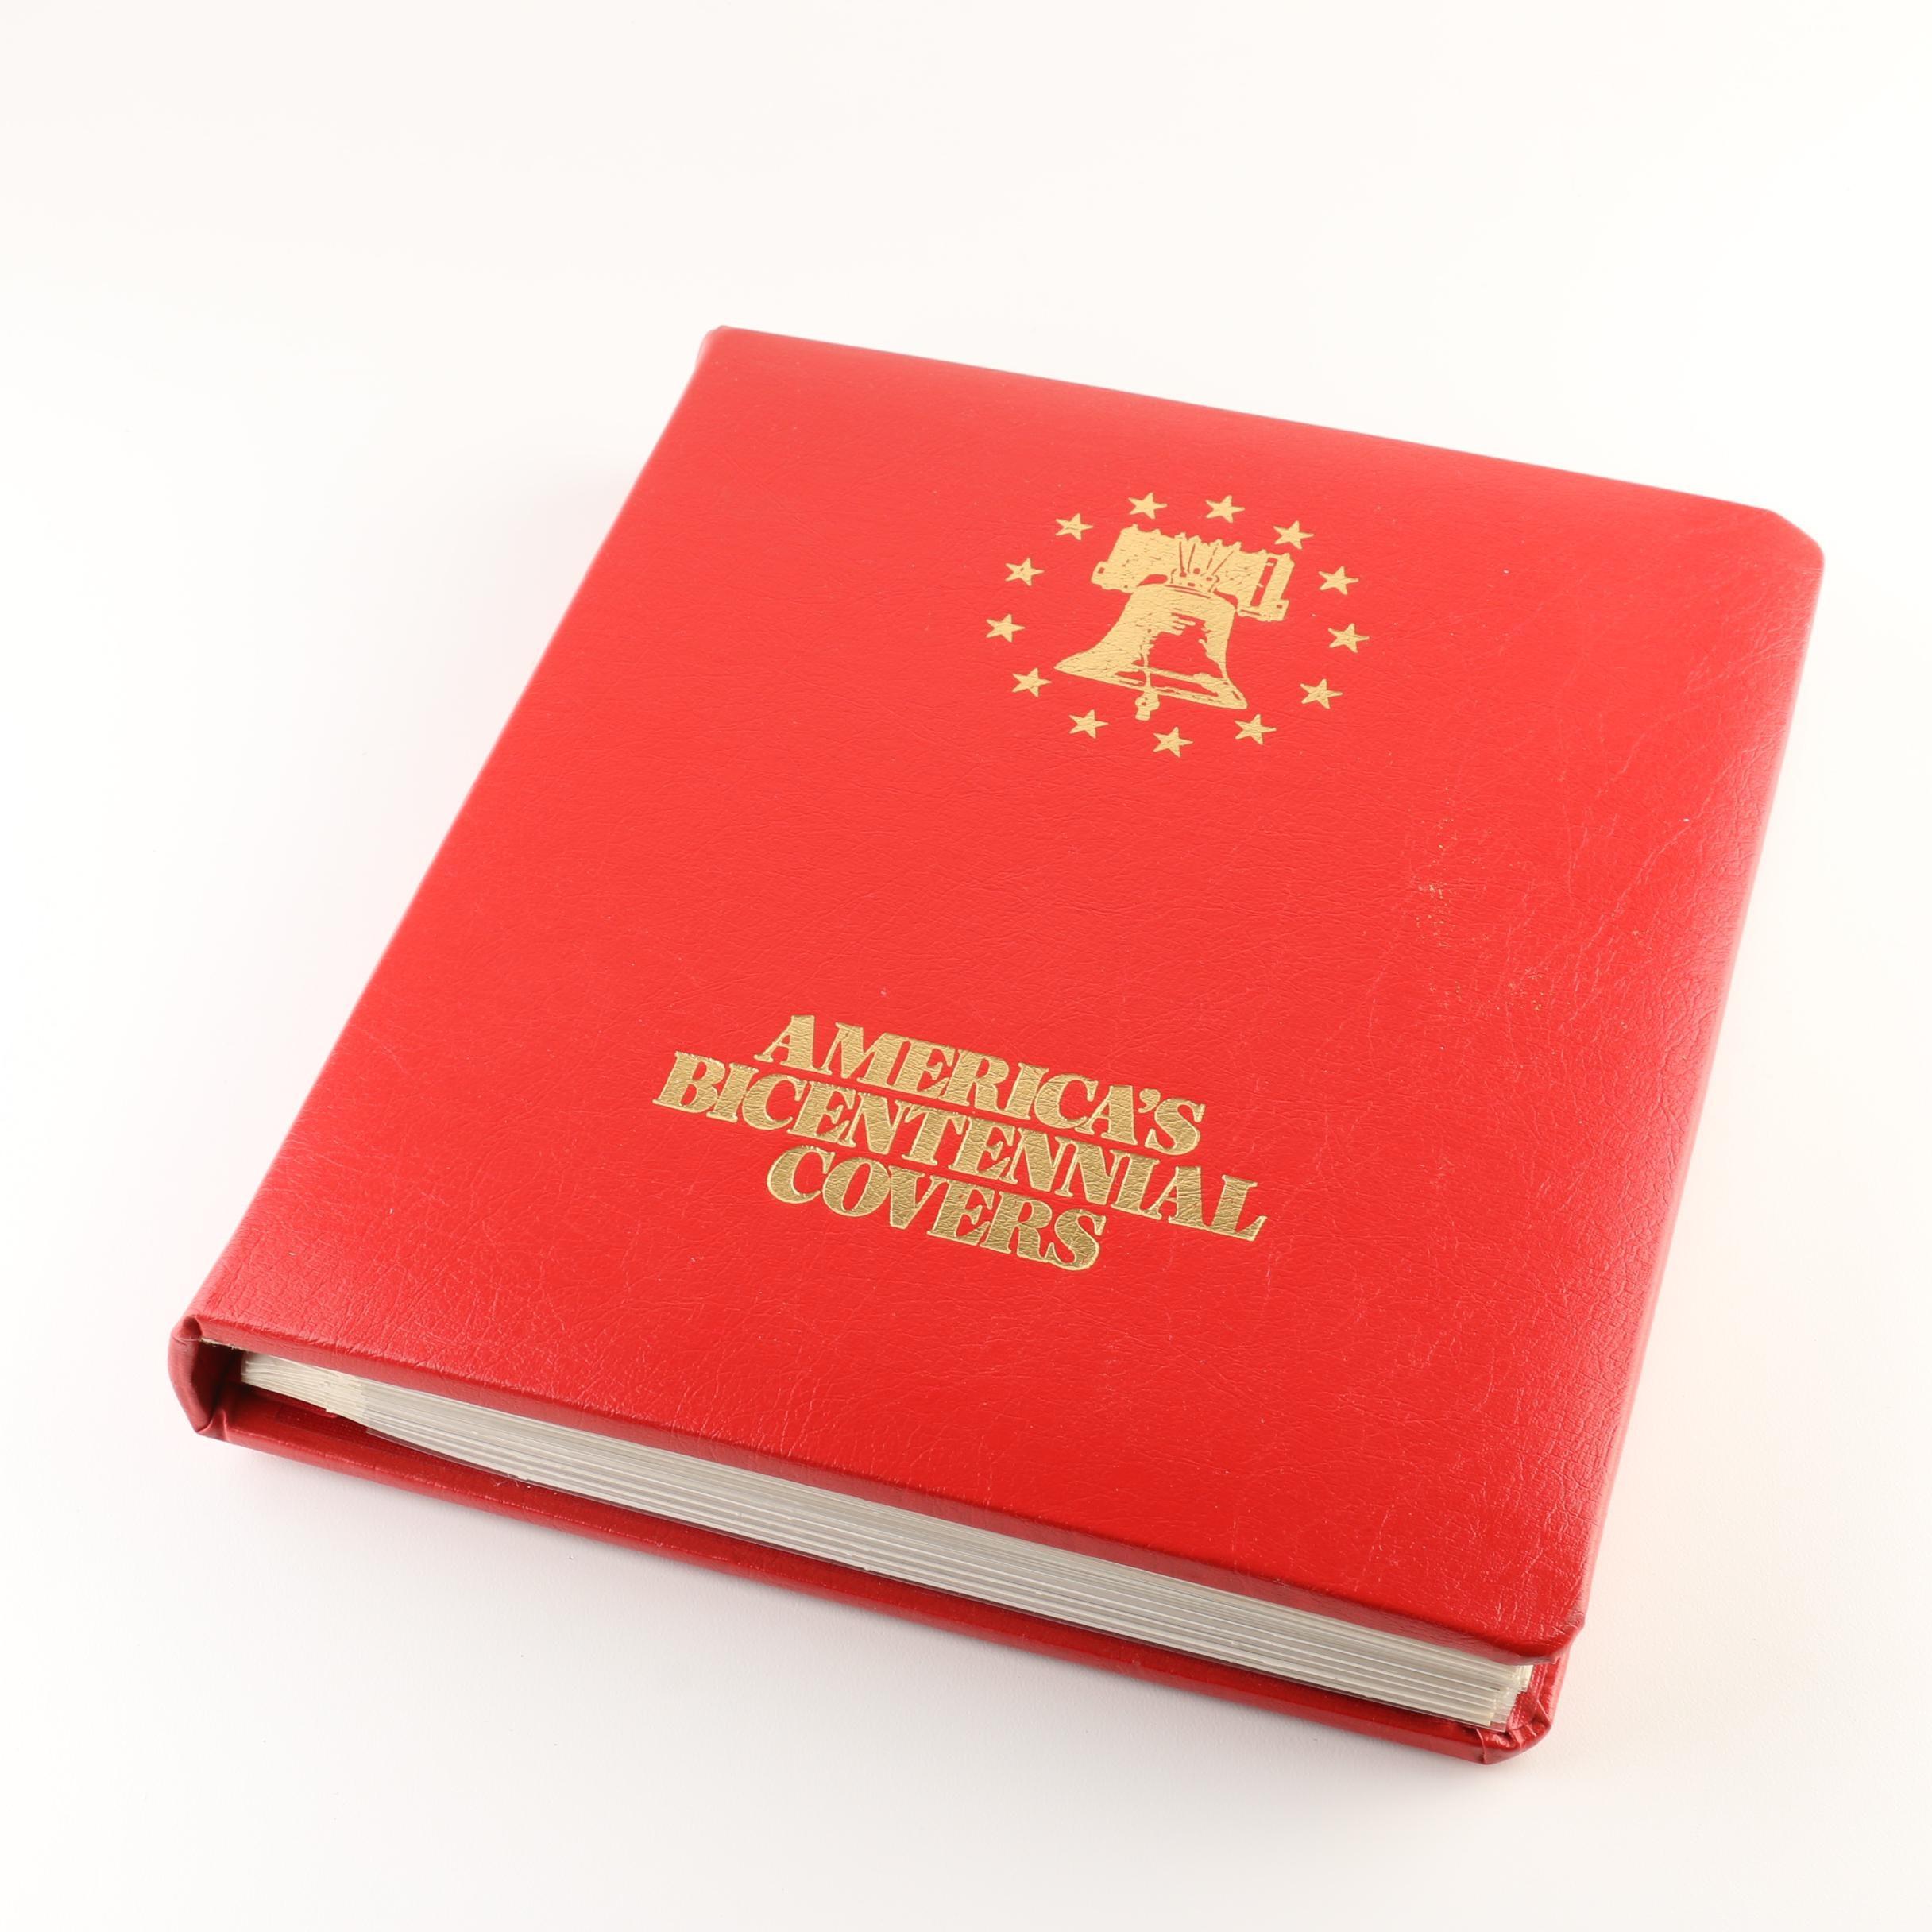 """America's Bicentennial Covers: 1776-1976 & 1777-1977"""